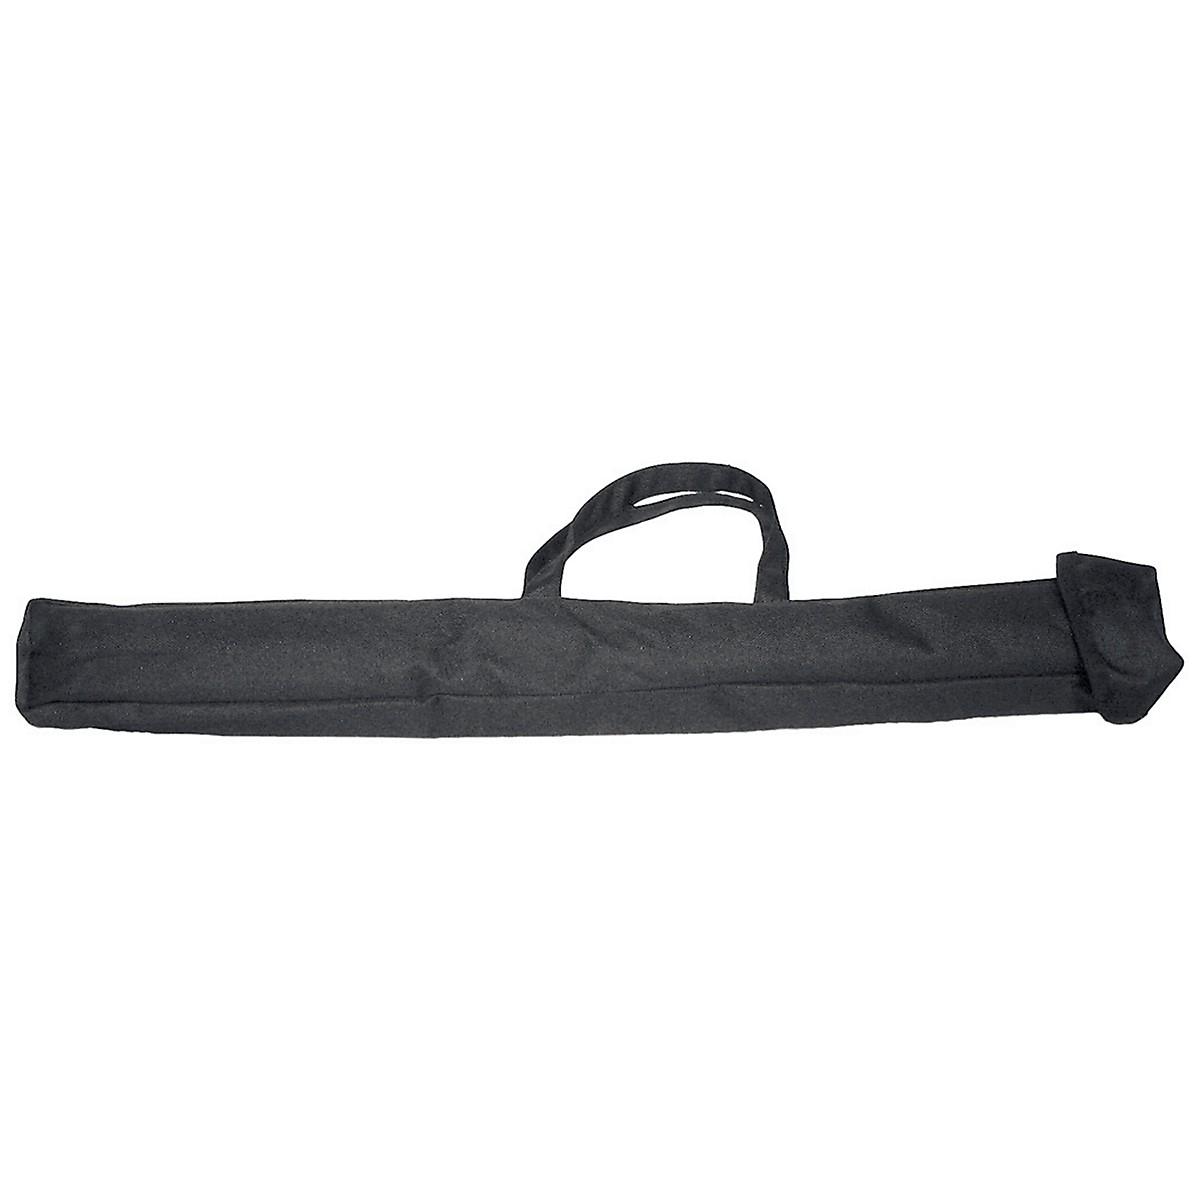 Kaces GCMSB1 Music Stand Carrying Bag